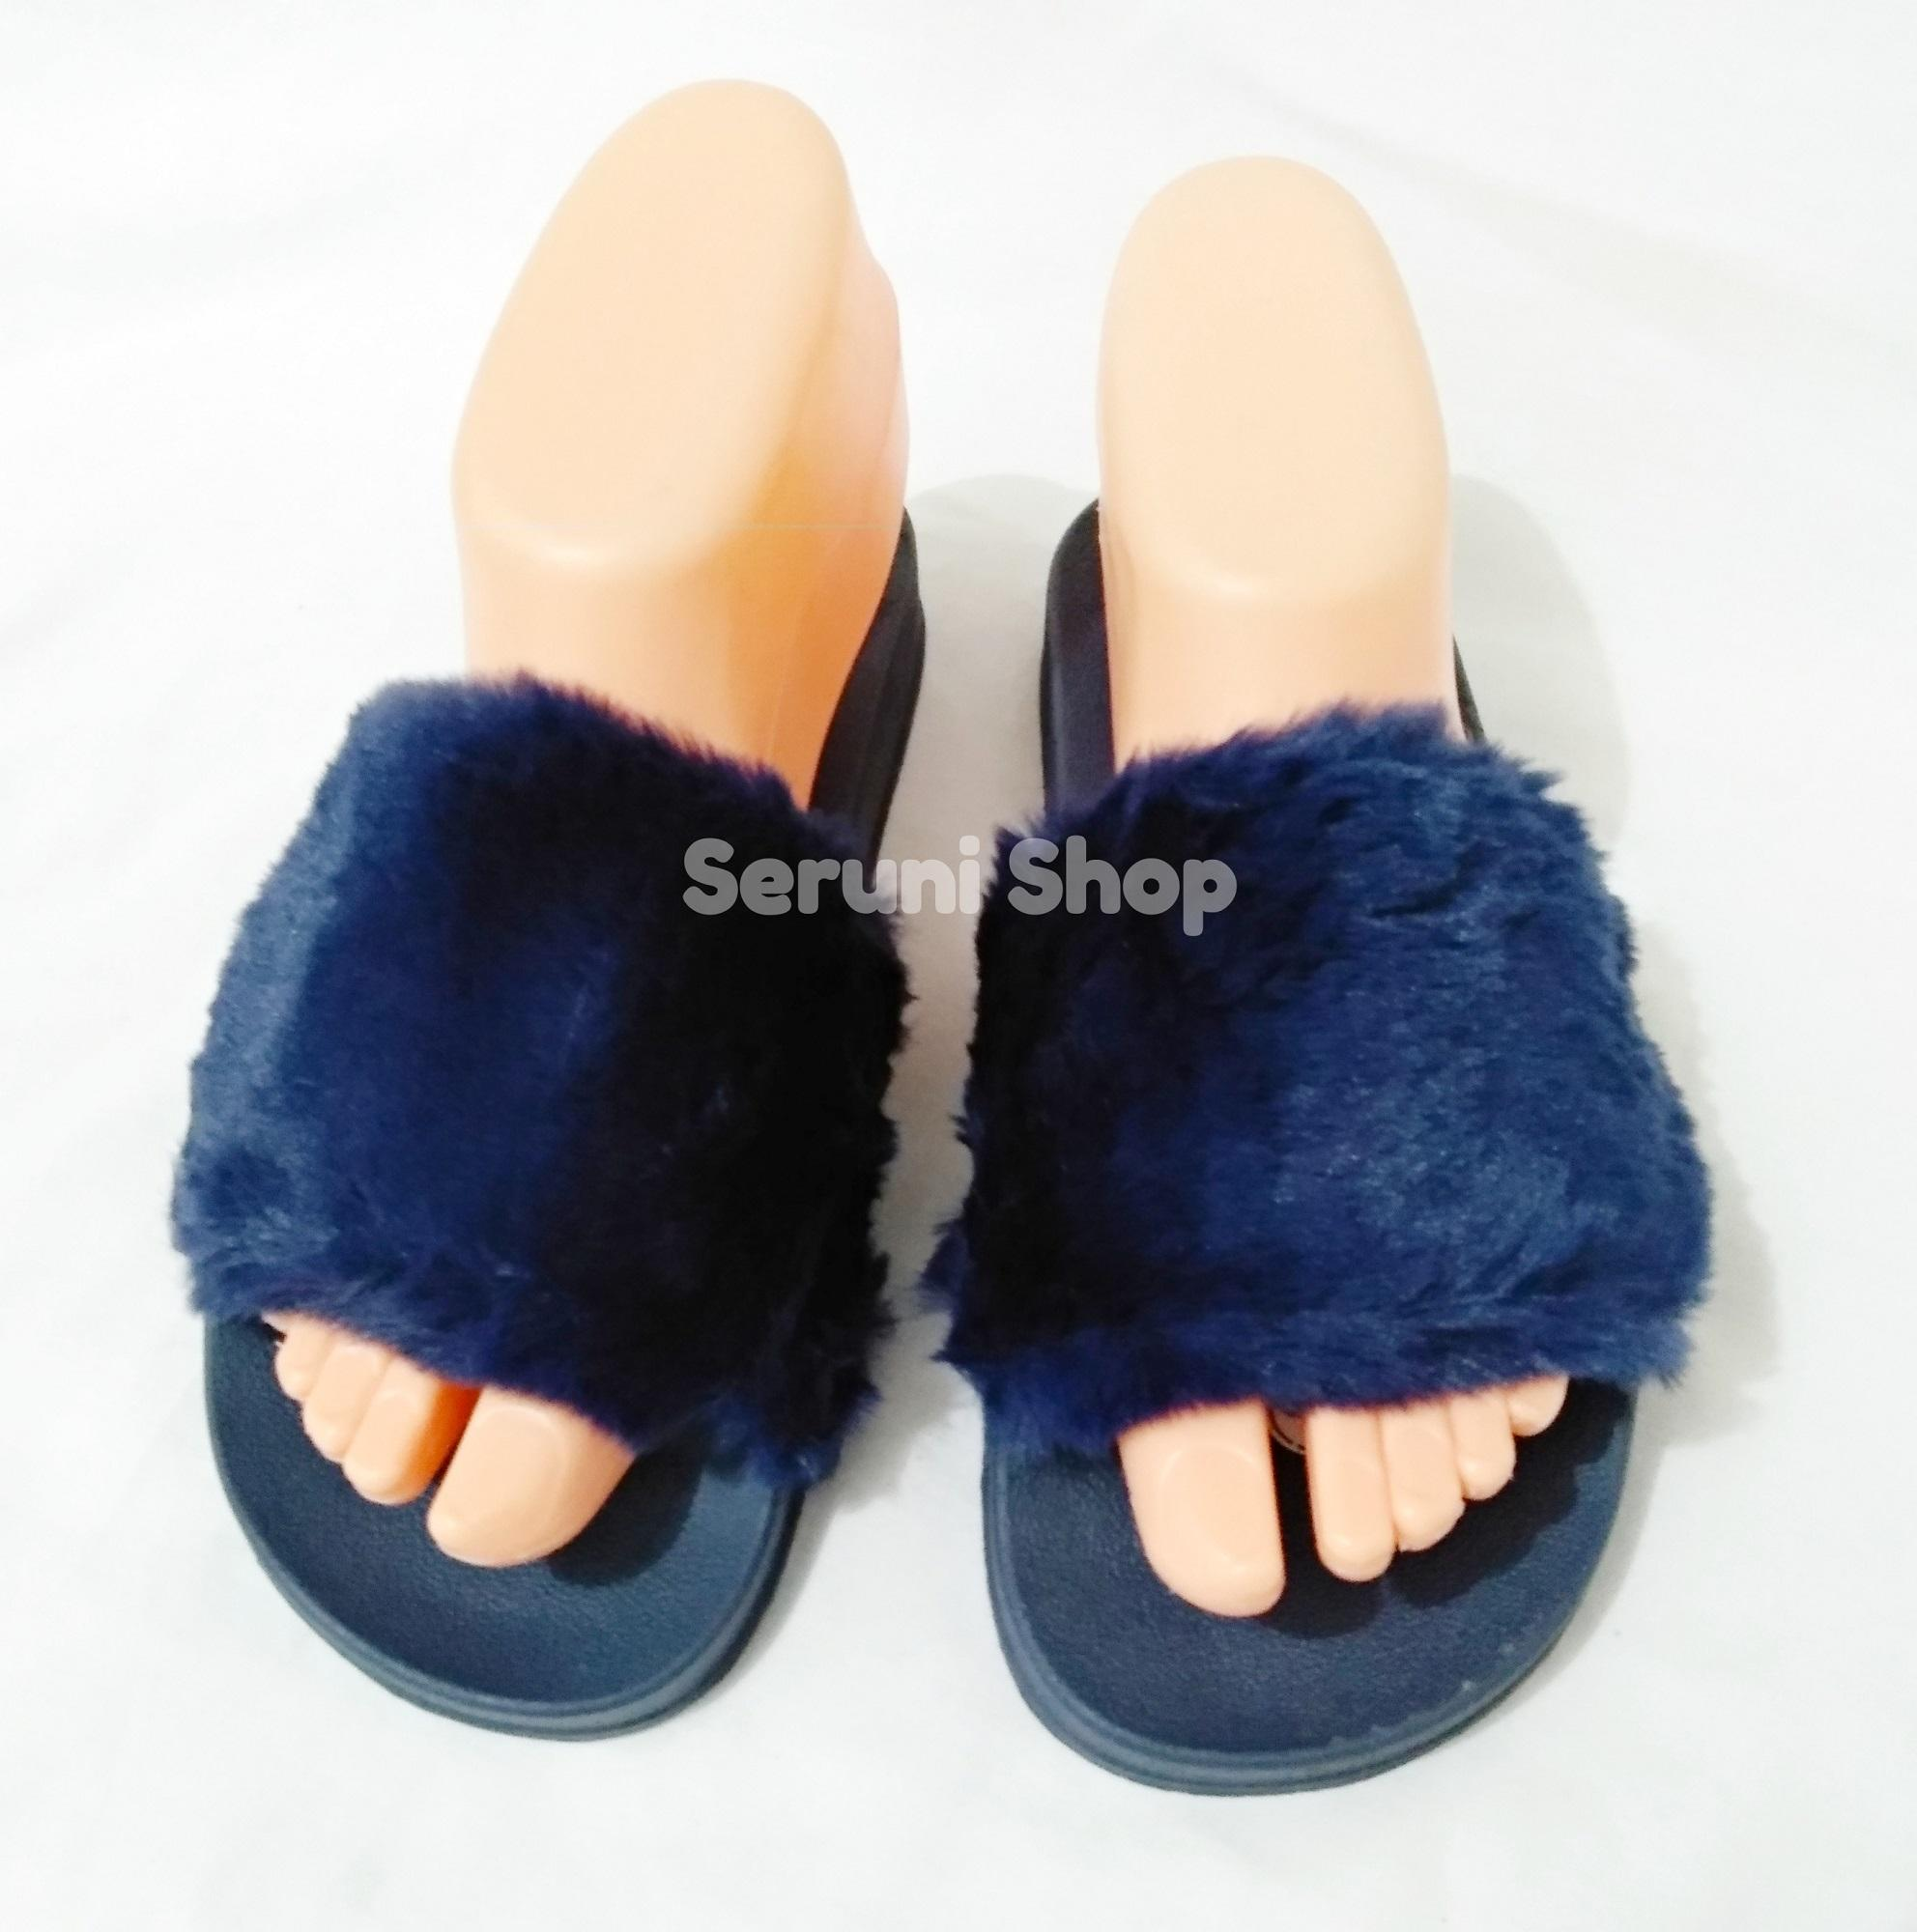 Seruni Love Sandal Bulu Biru Navy